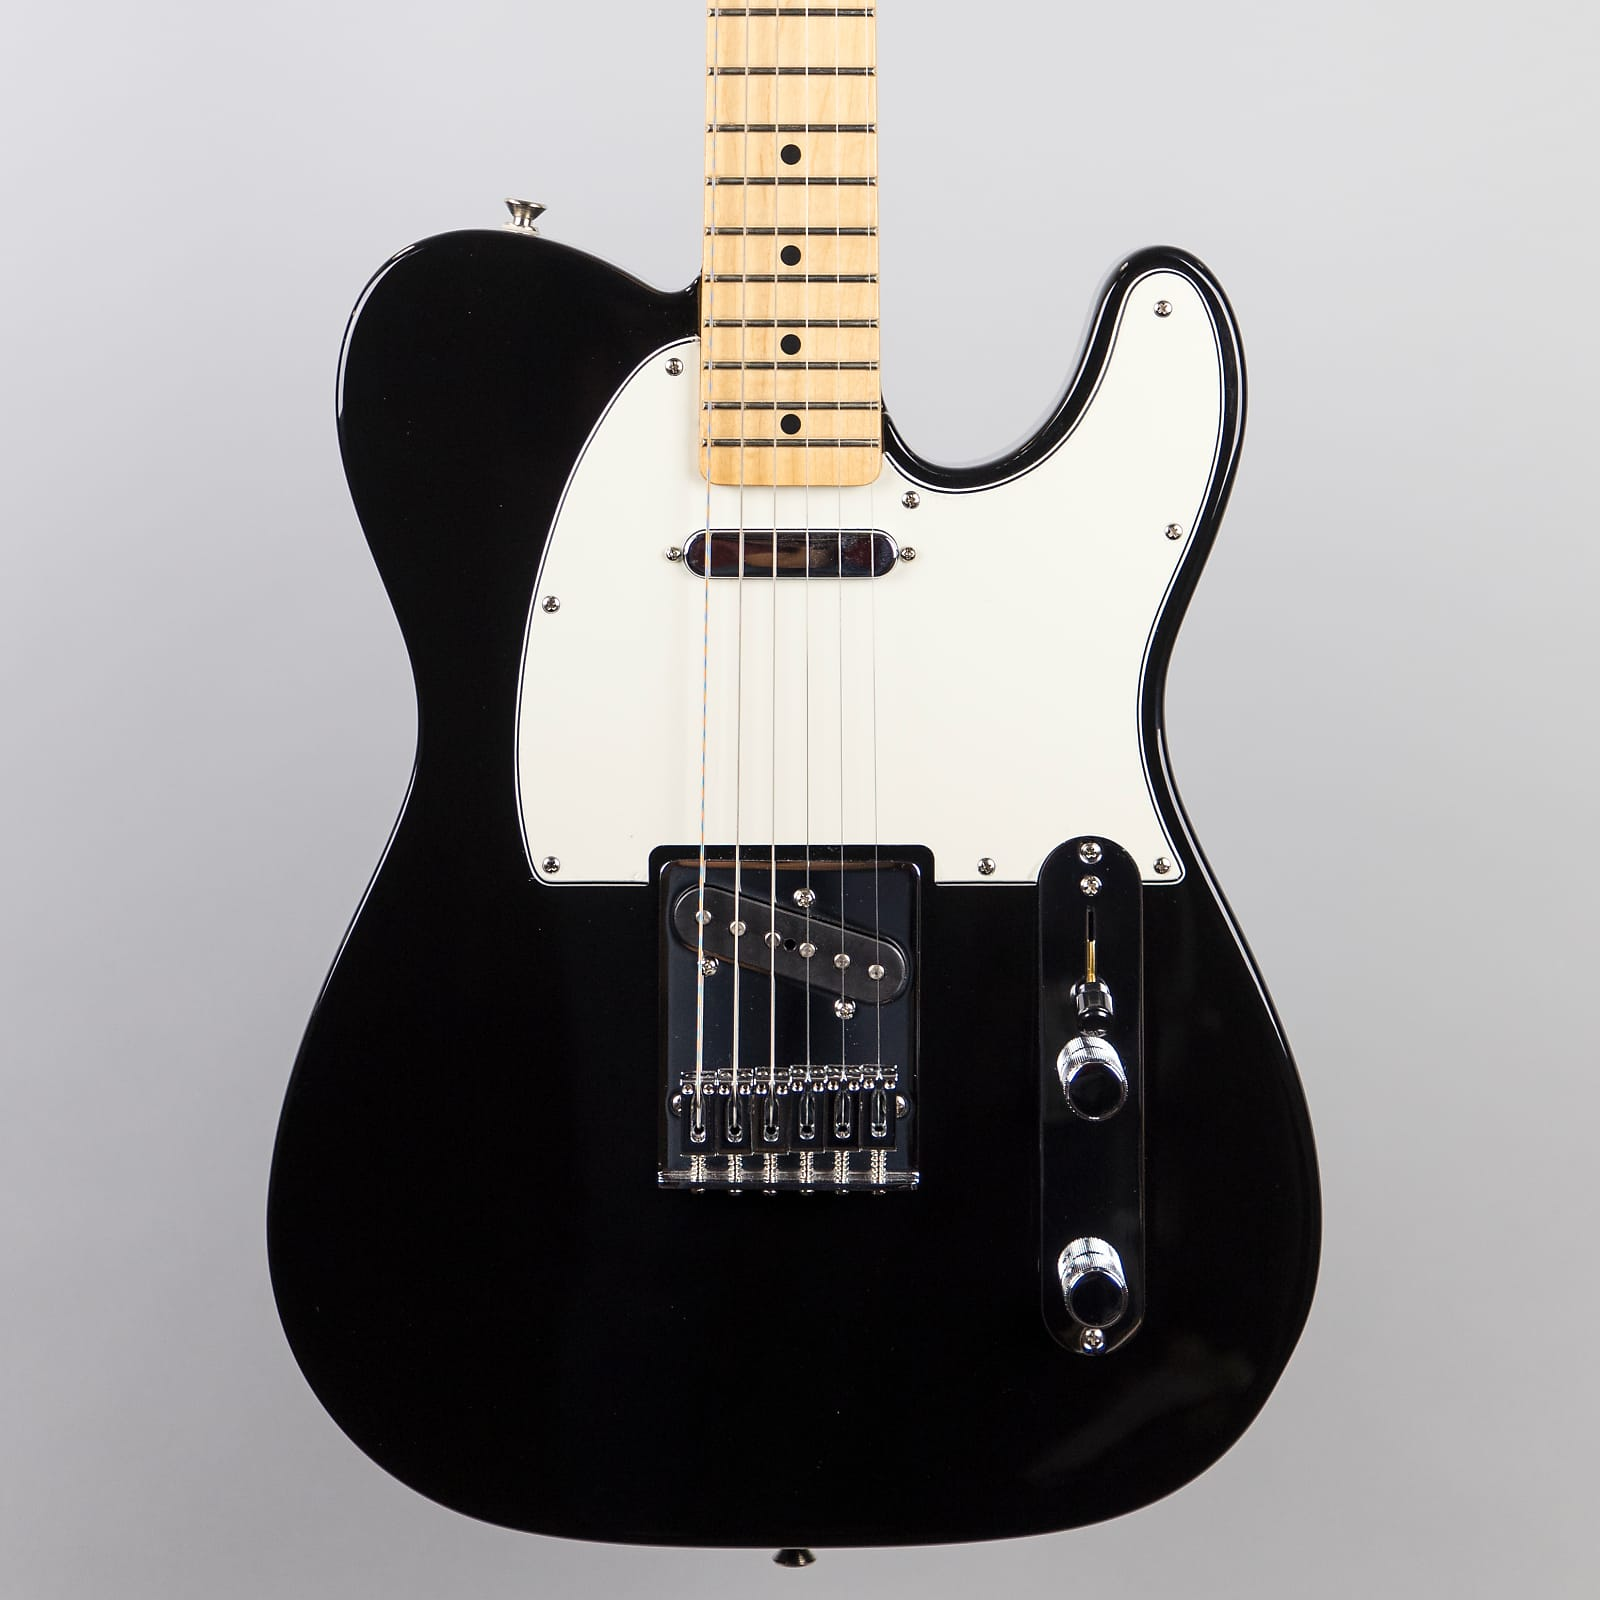 Fender Standard Telecaster in Black